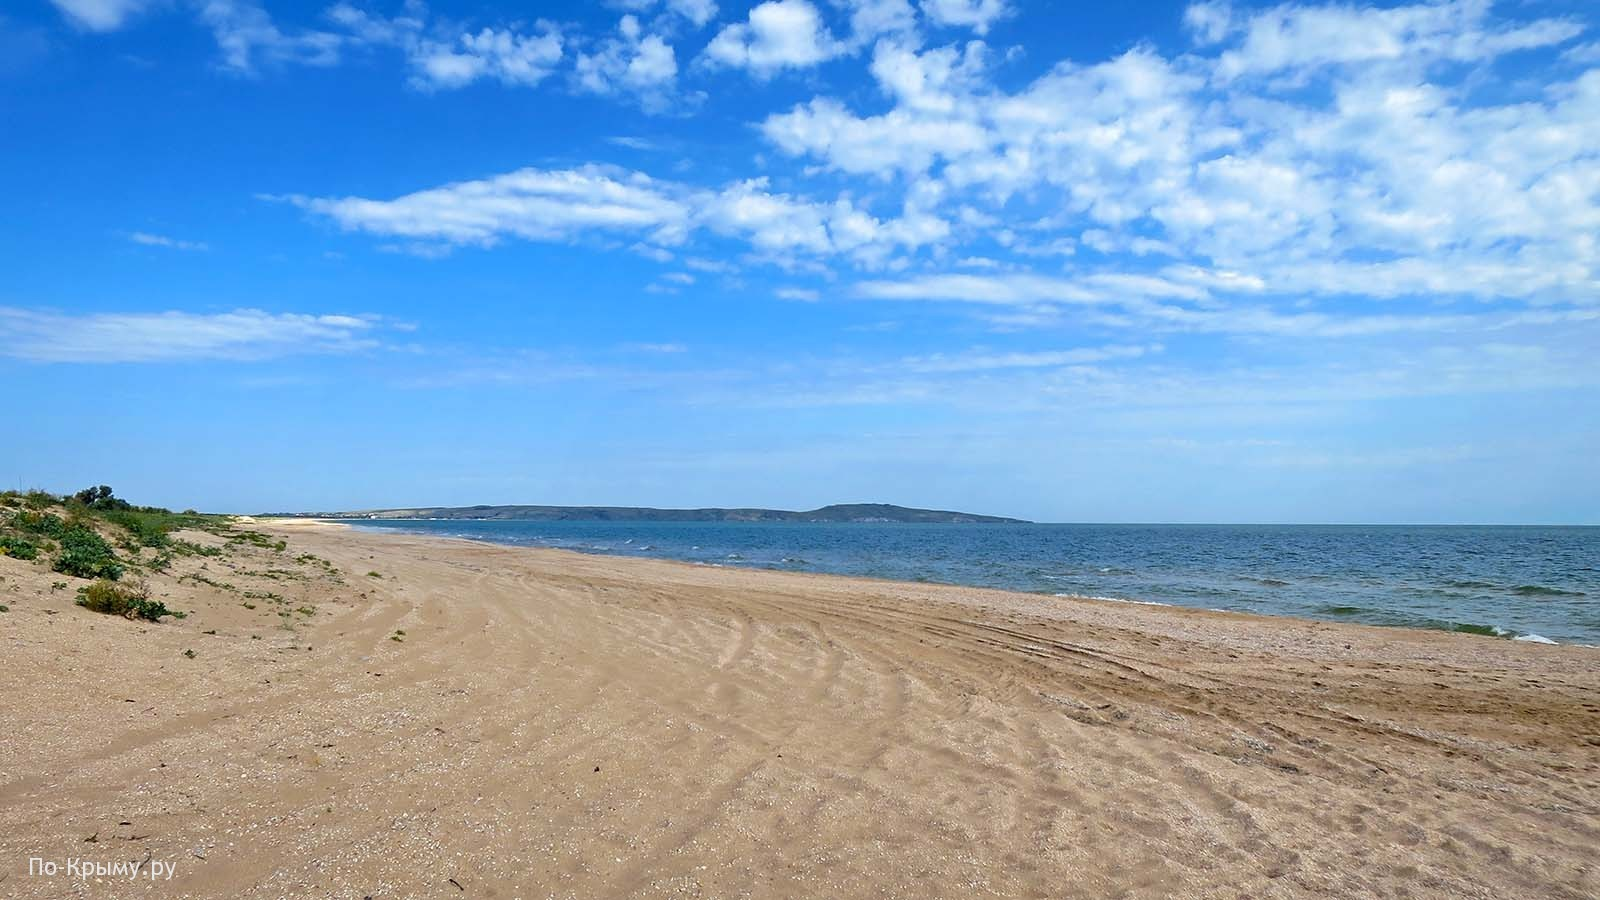 Берег Азовского моря. Казантипский залив